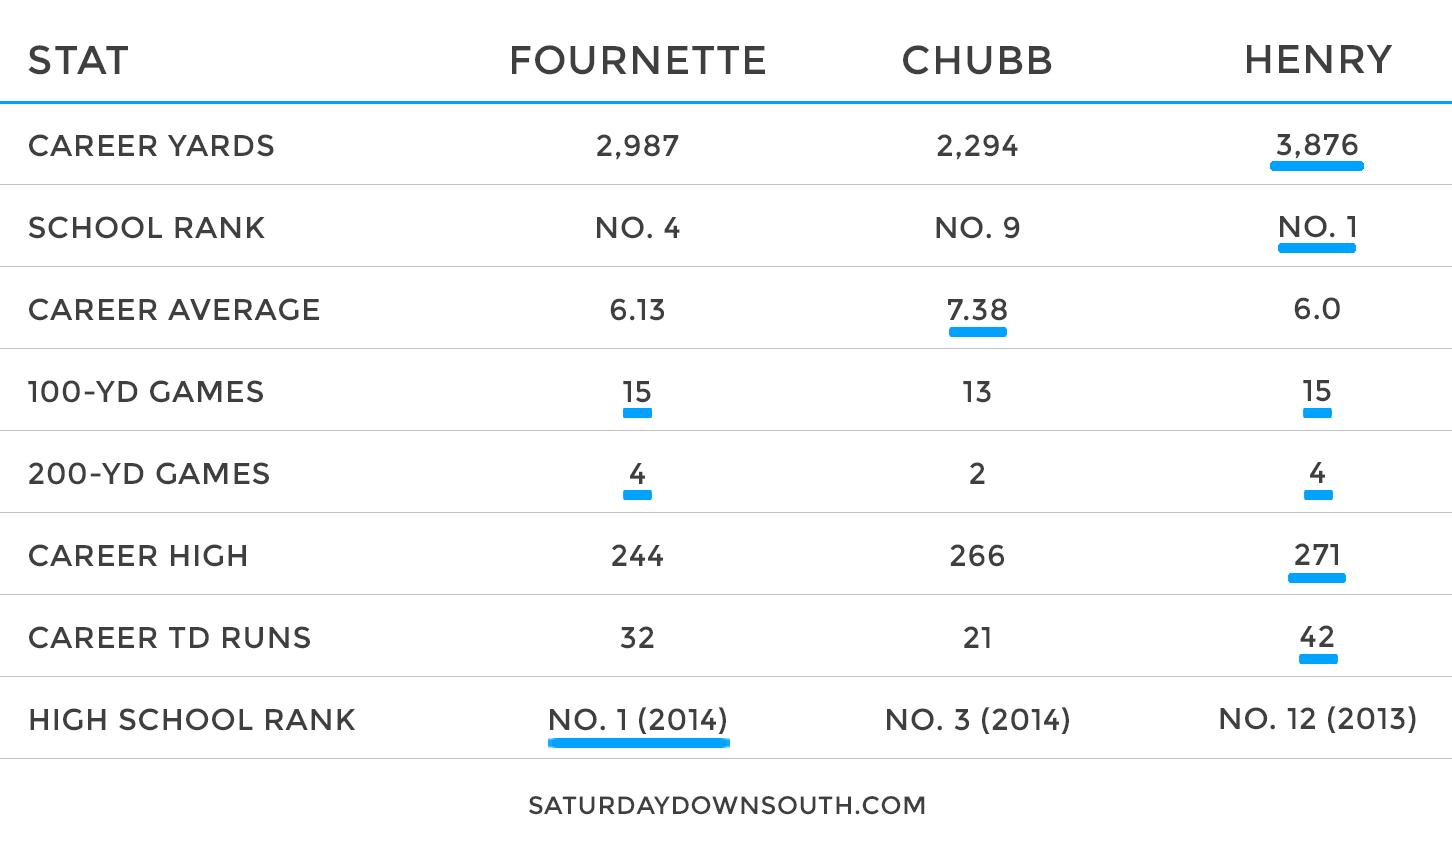 chubb-fournette-henry